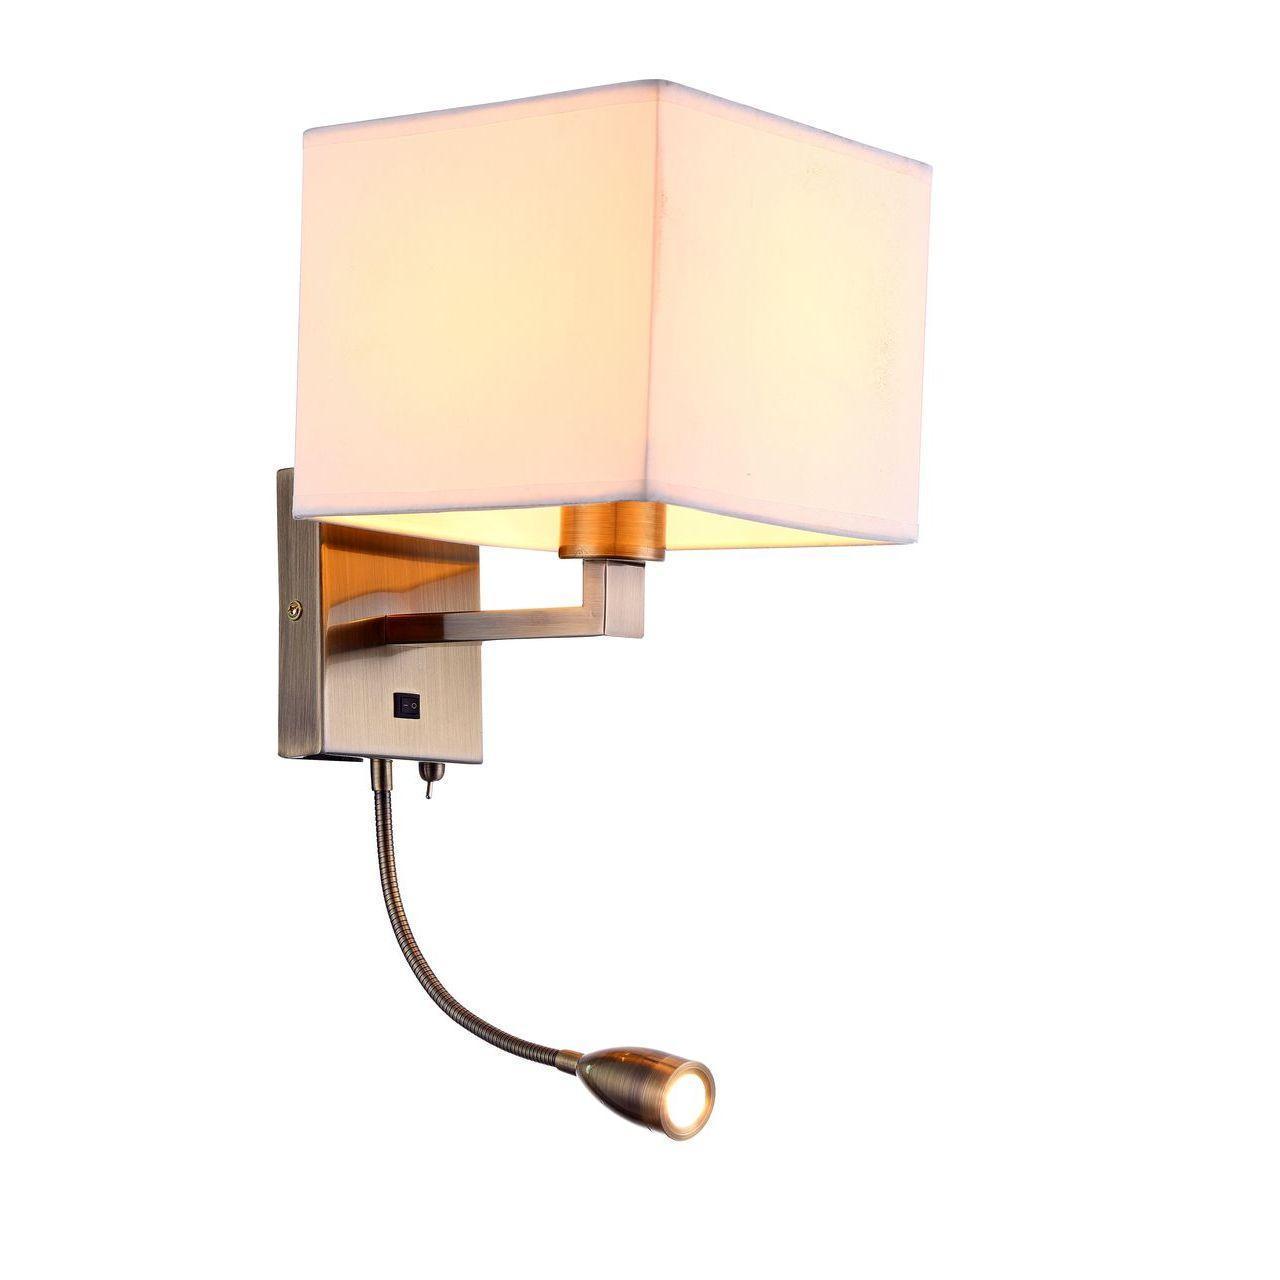 Бра Arte Lamp Hall A9249AP-2AB arte lamp бра artelamp a3777ap 2ab